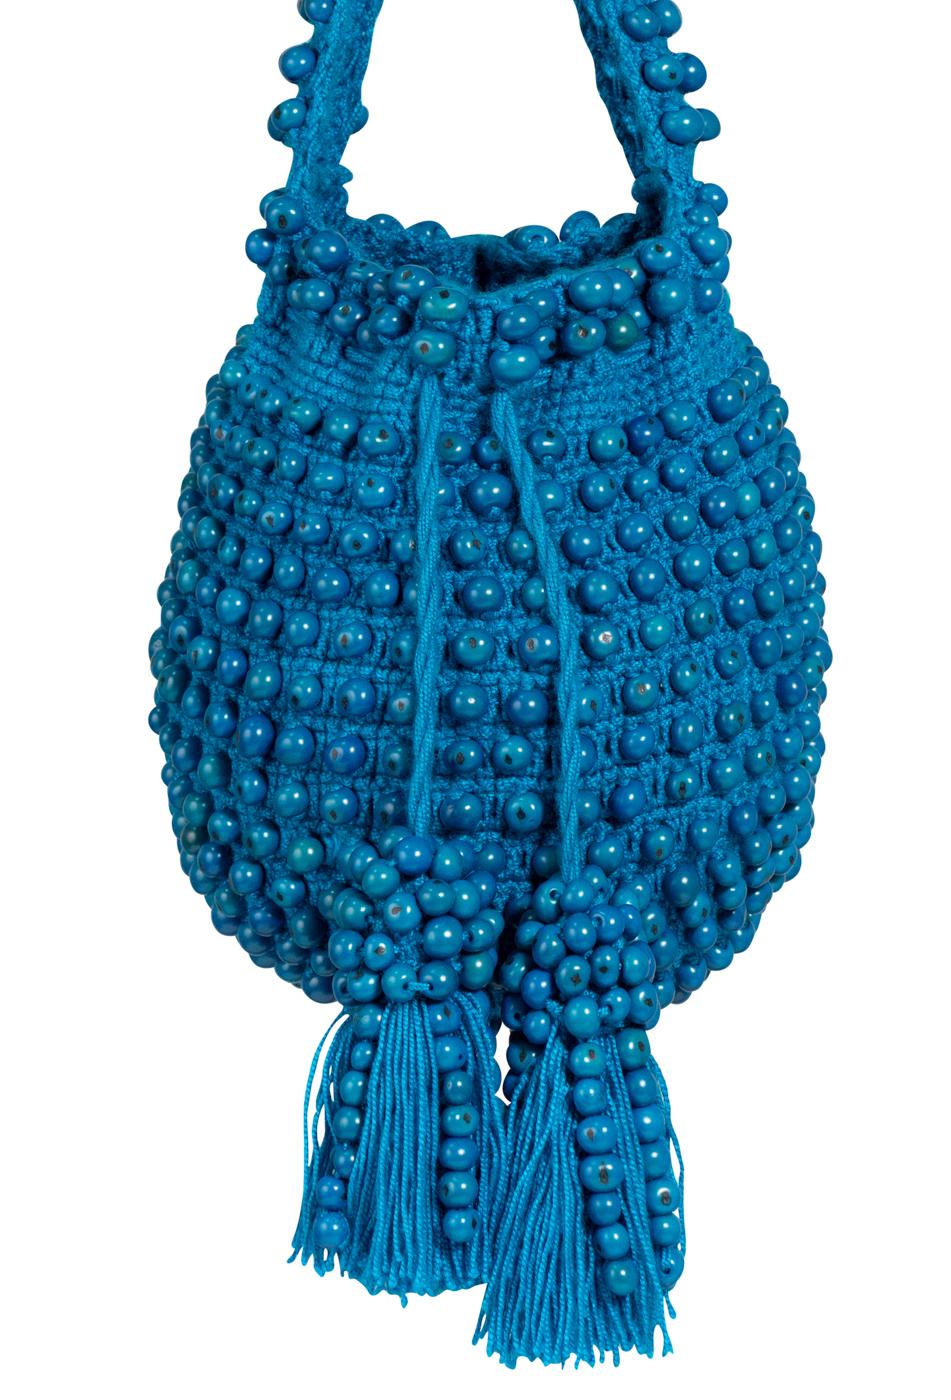 Mochila crochet tagua azul